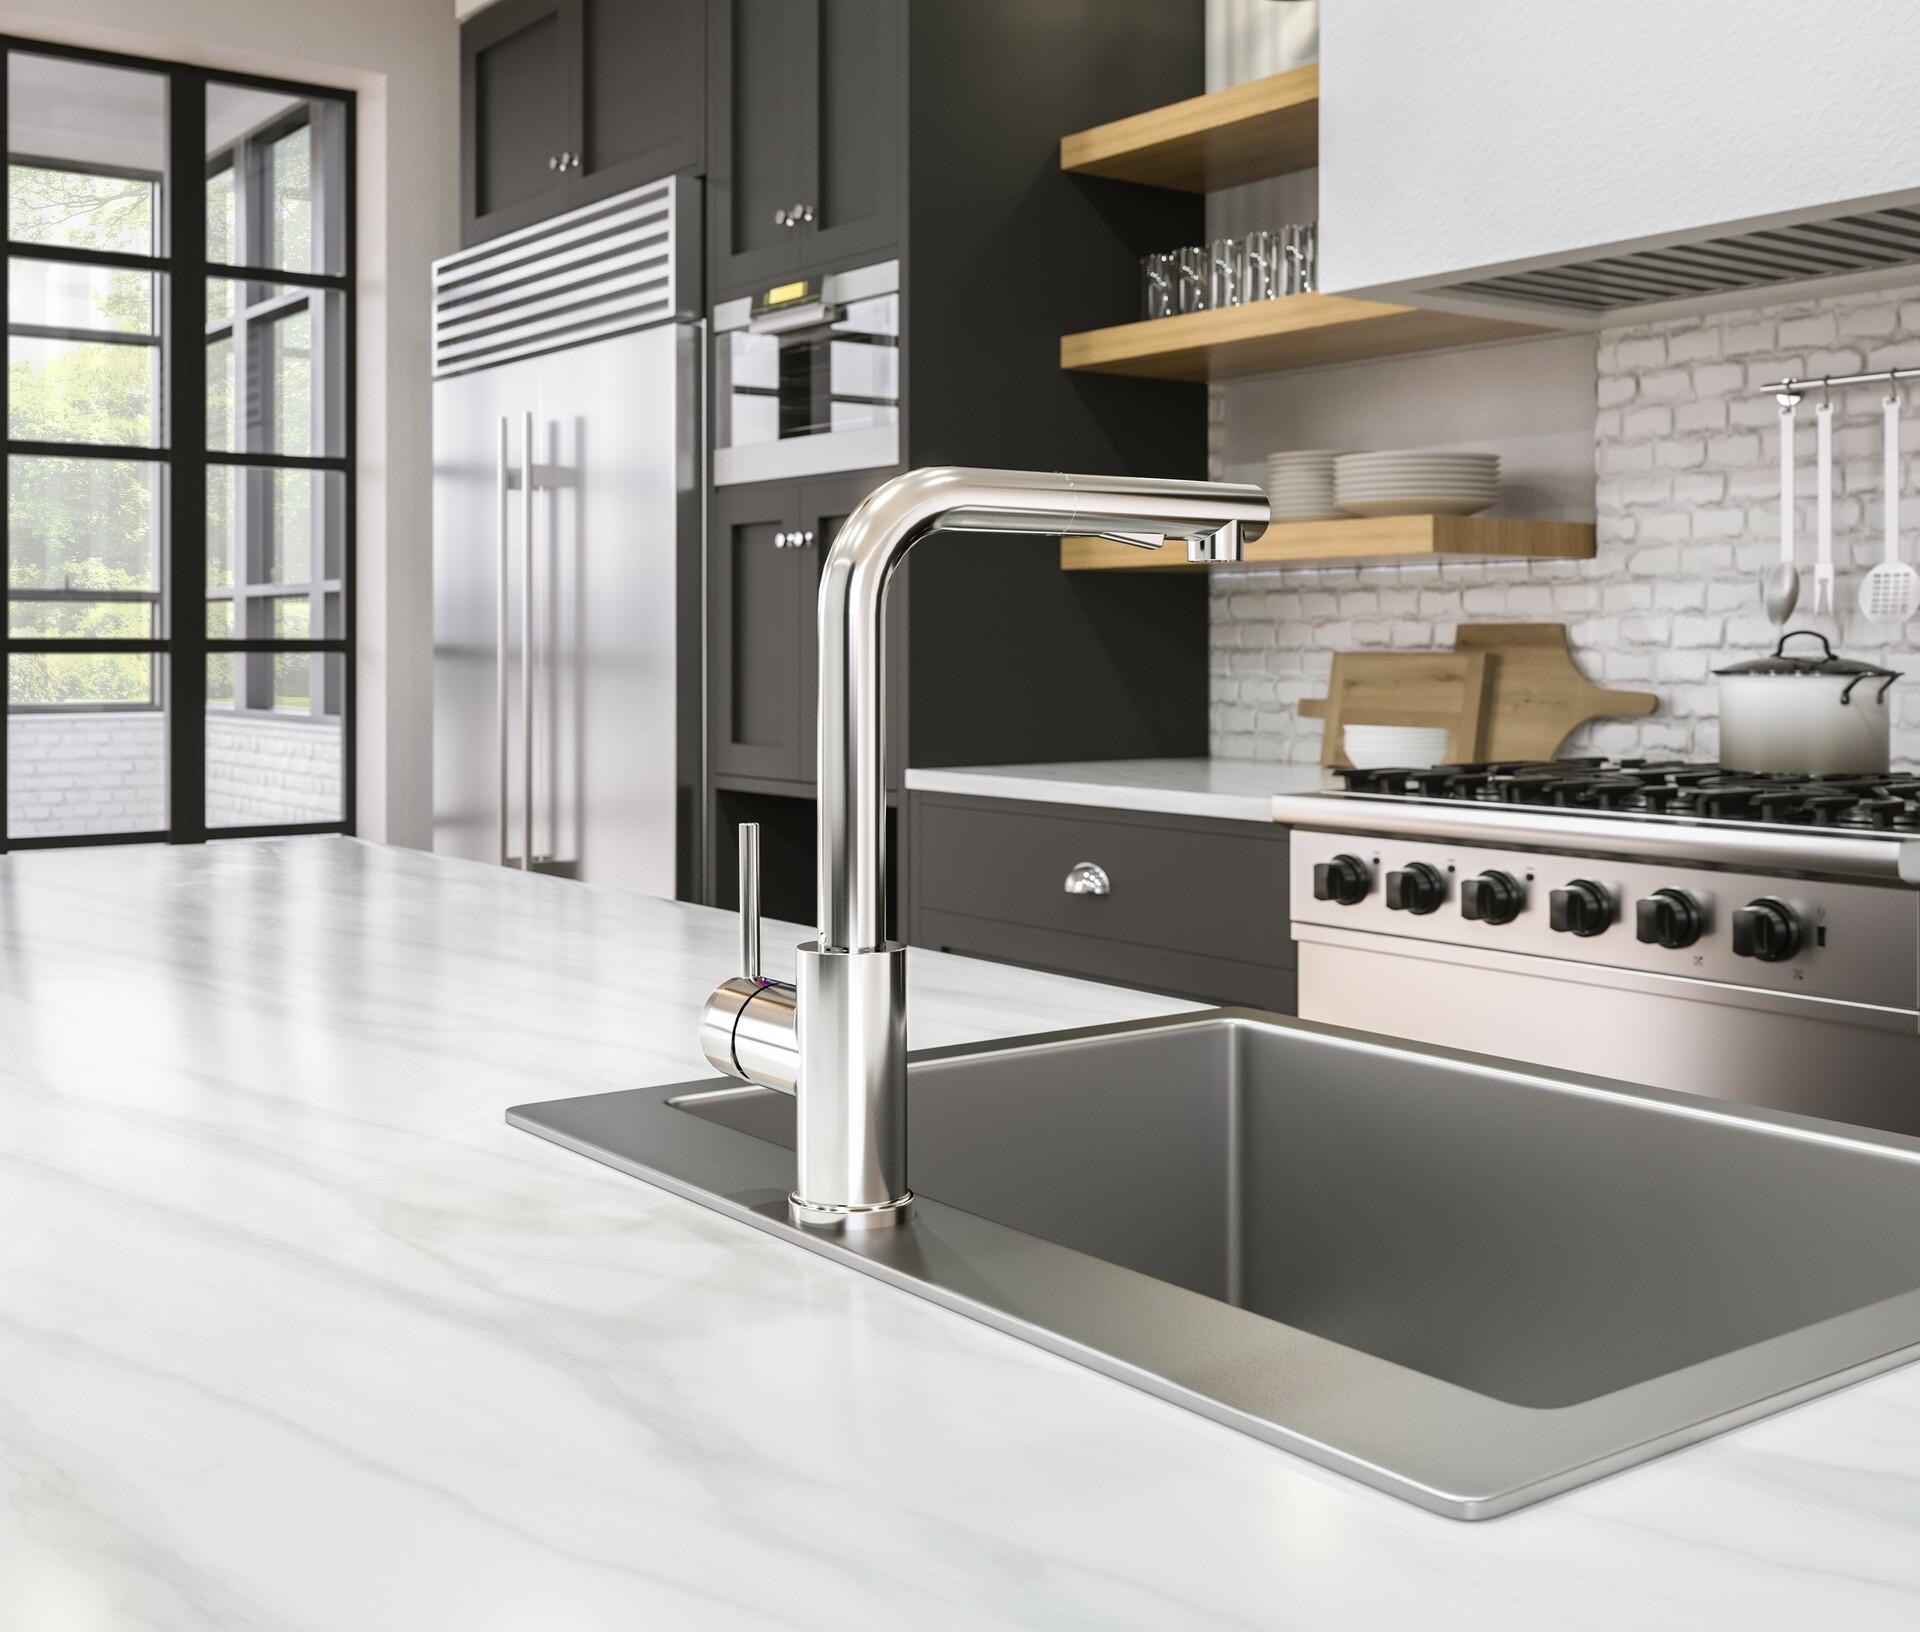 Derek malone stealer faucet kitchen faucet detail r2